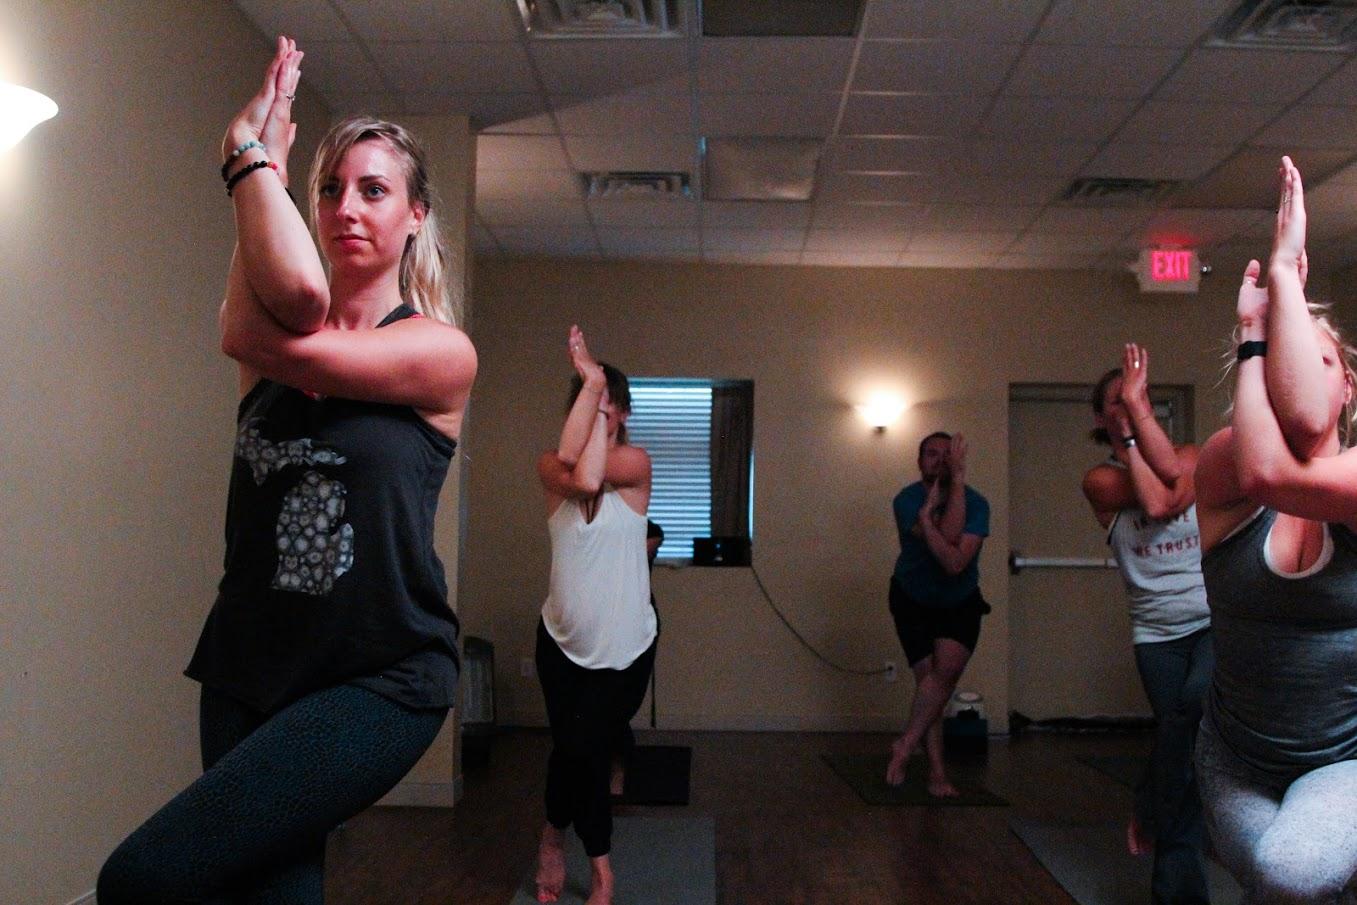 Brighton Yoga Center Photos (Edited)-78.jpg